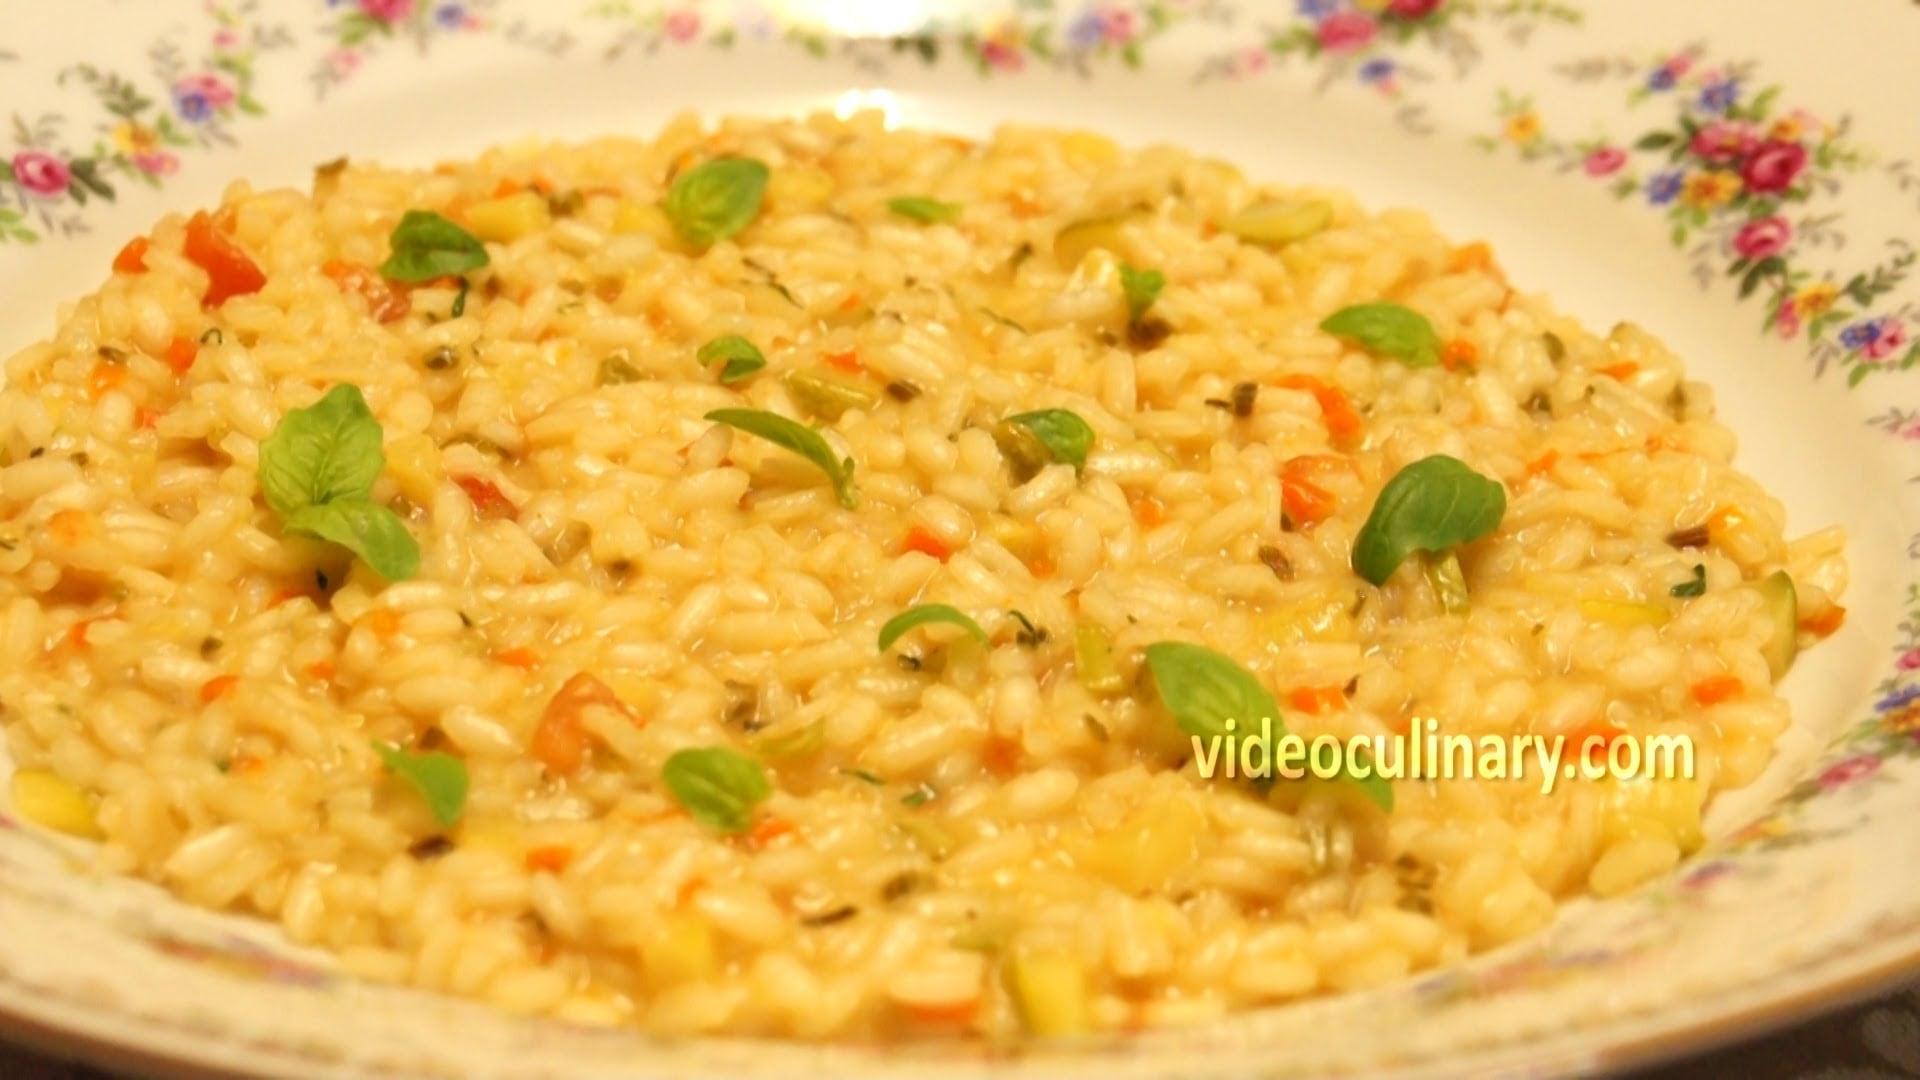 Italian Vegetarian Risotto Recipe – Video Culinary